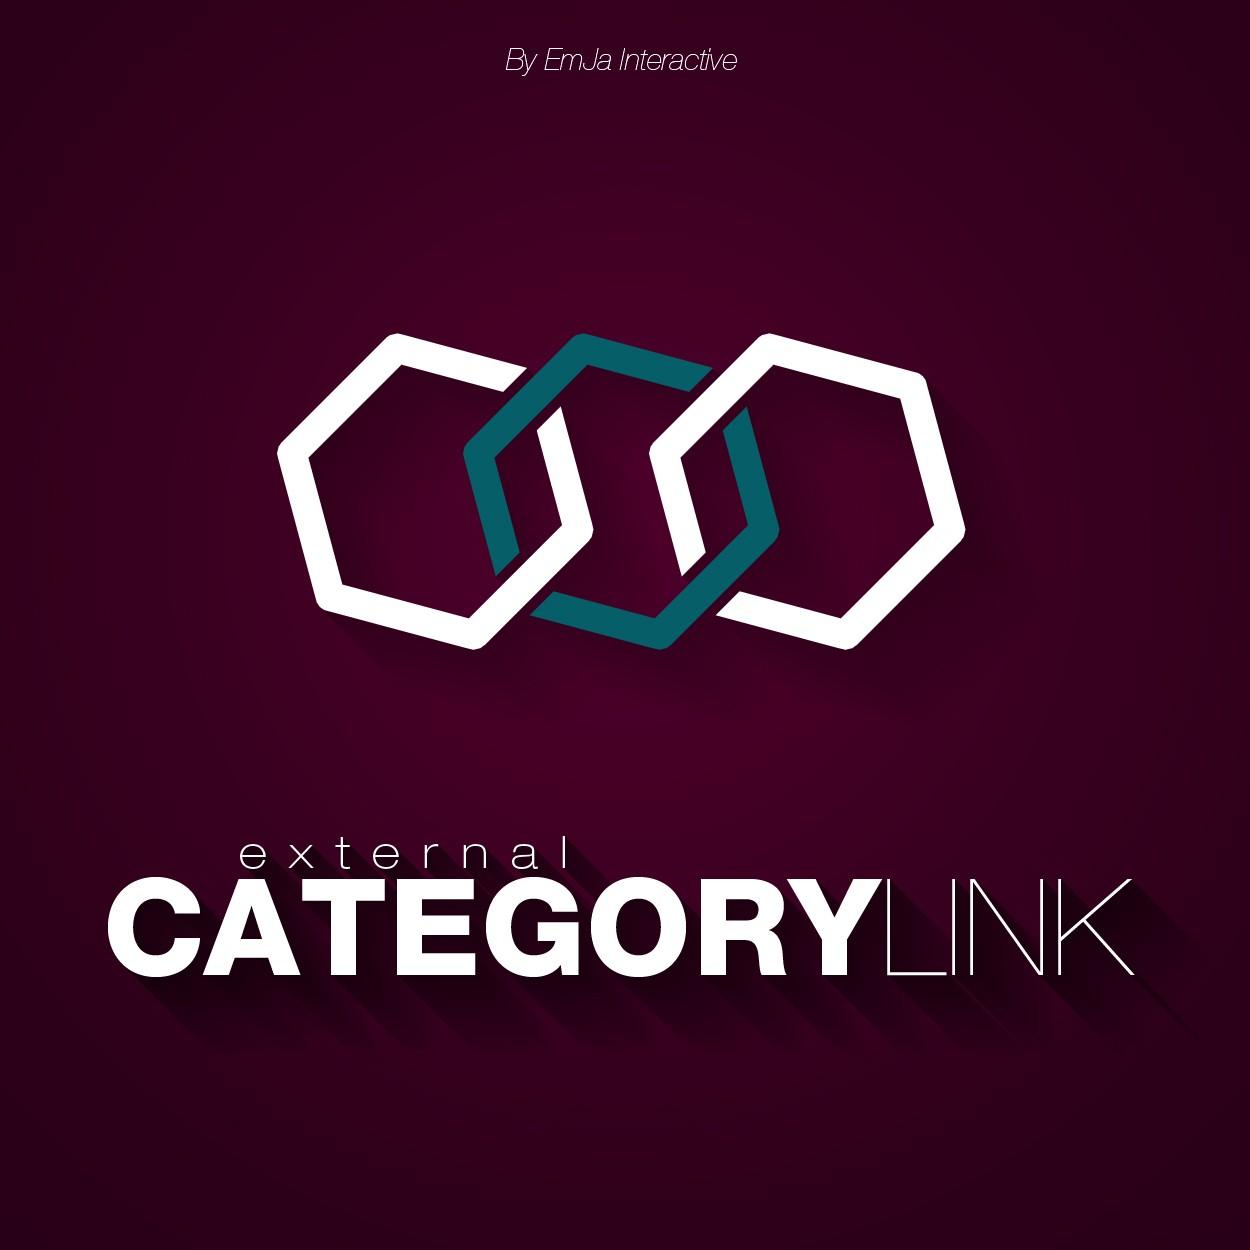 External Category Link - Box Art